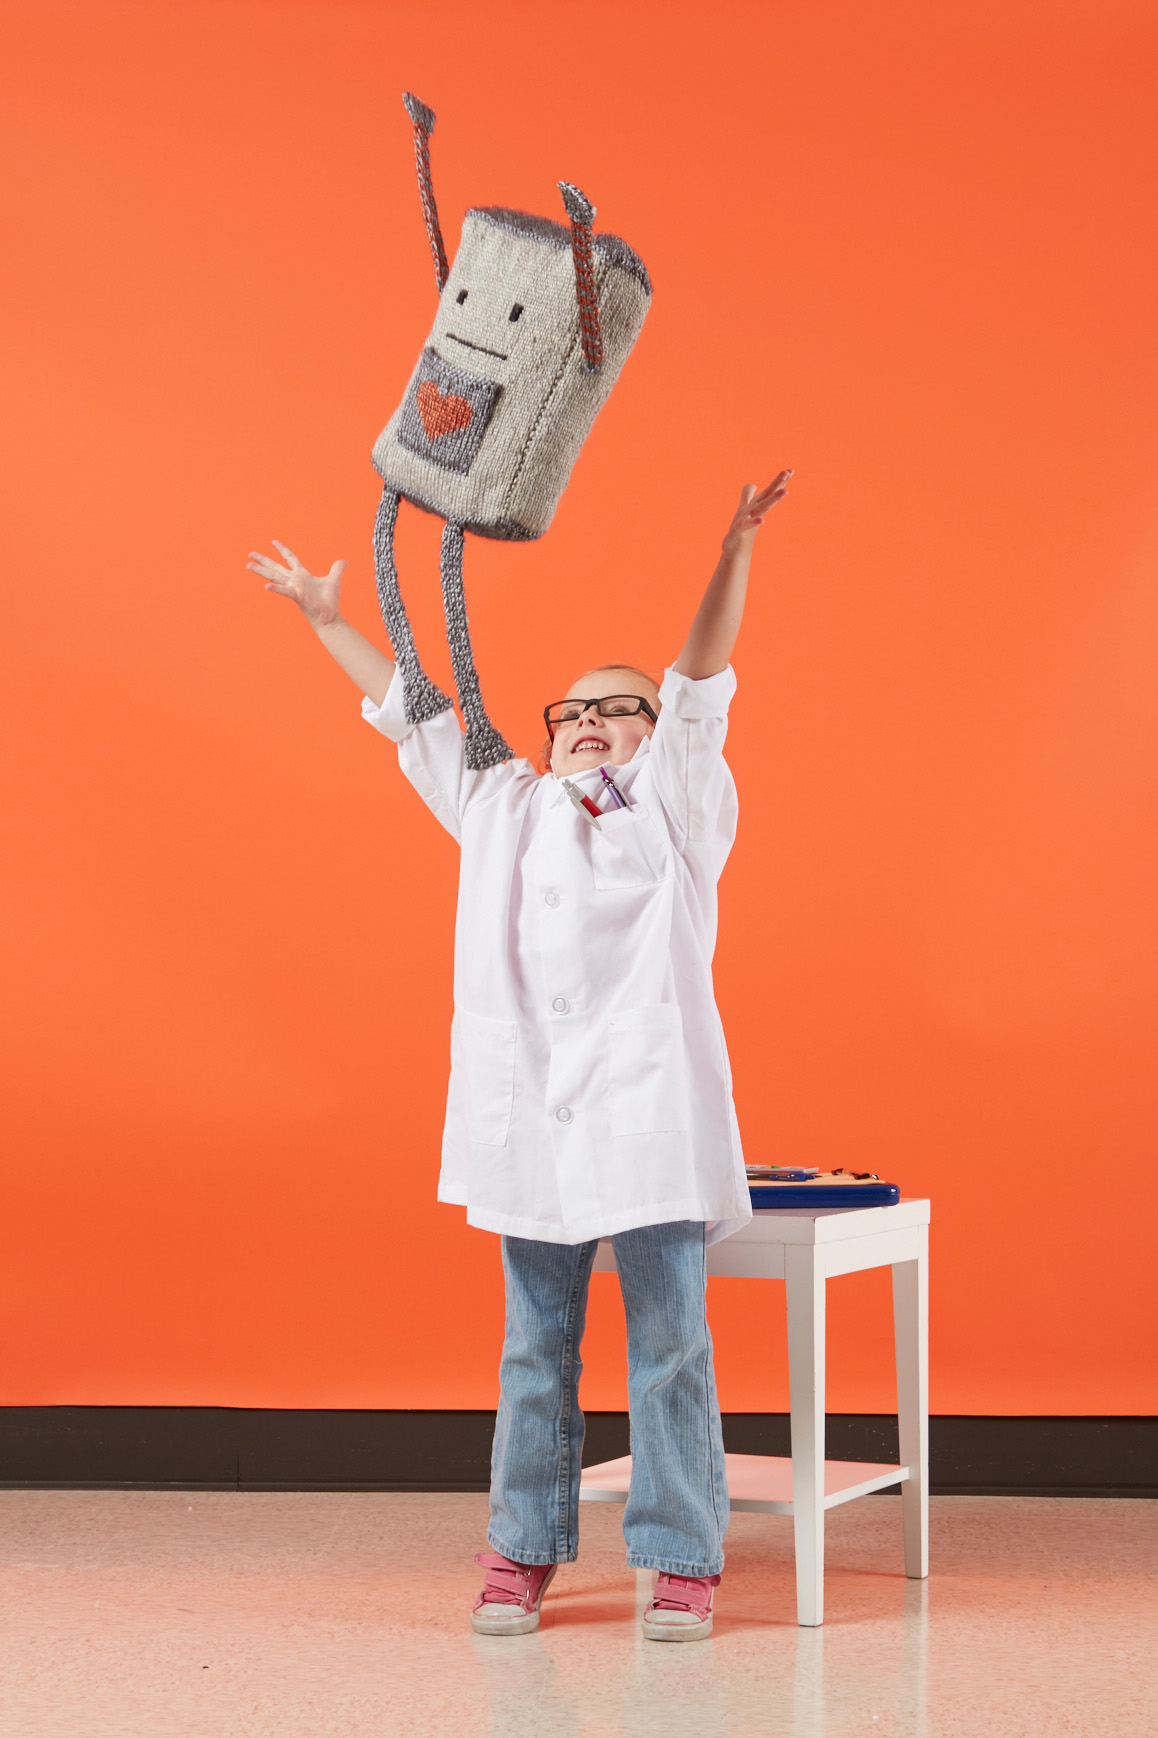 Mr. Robotics